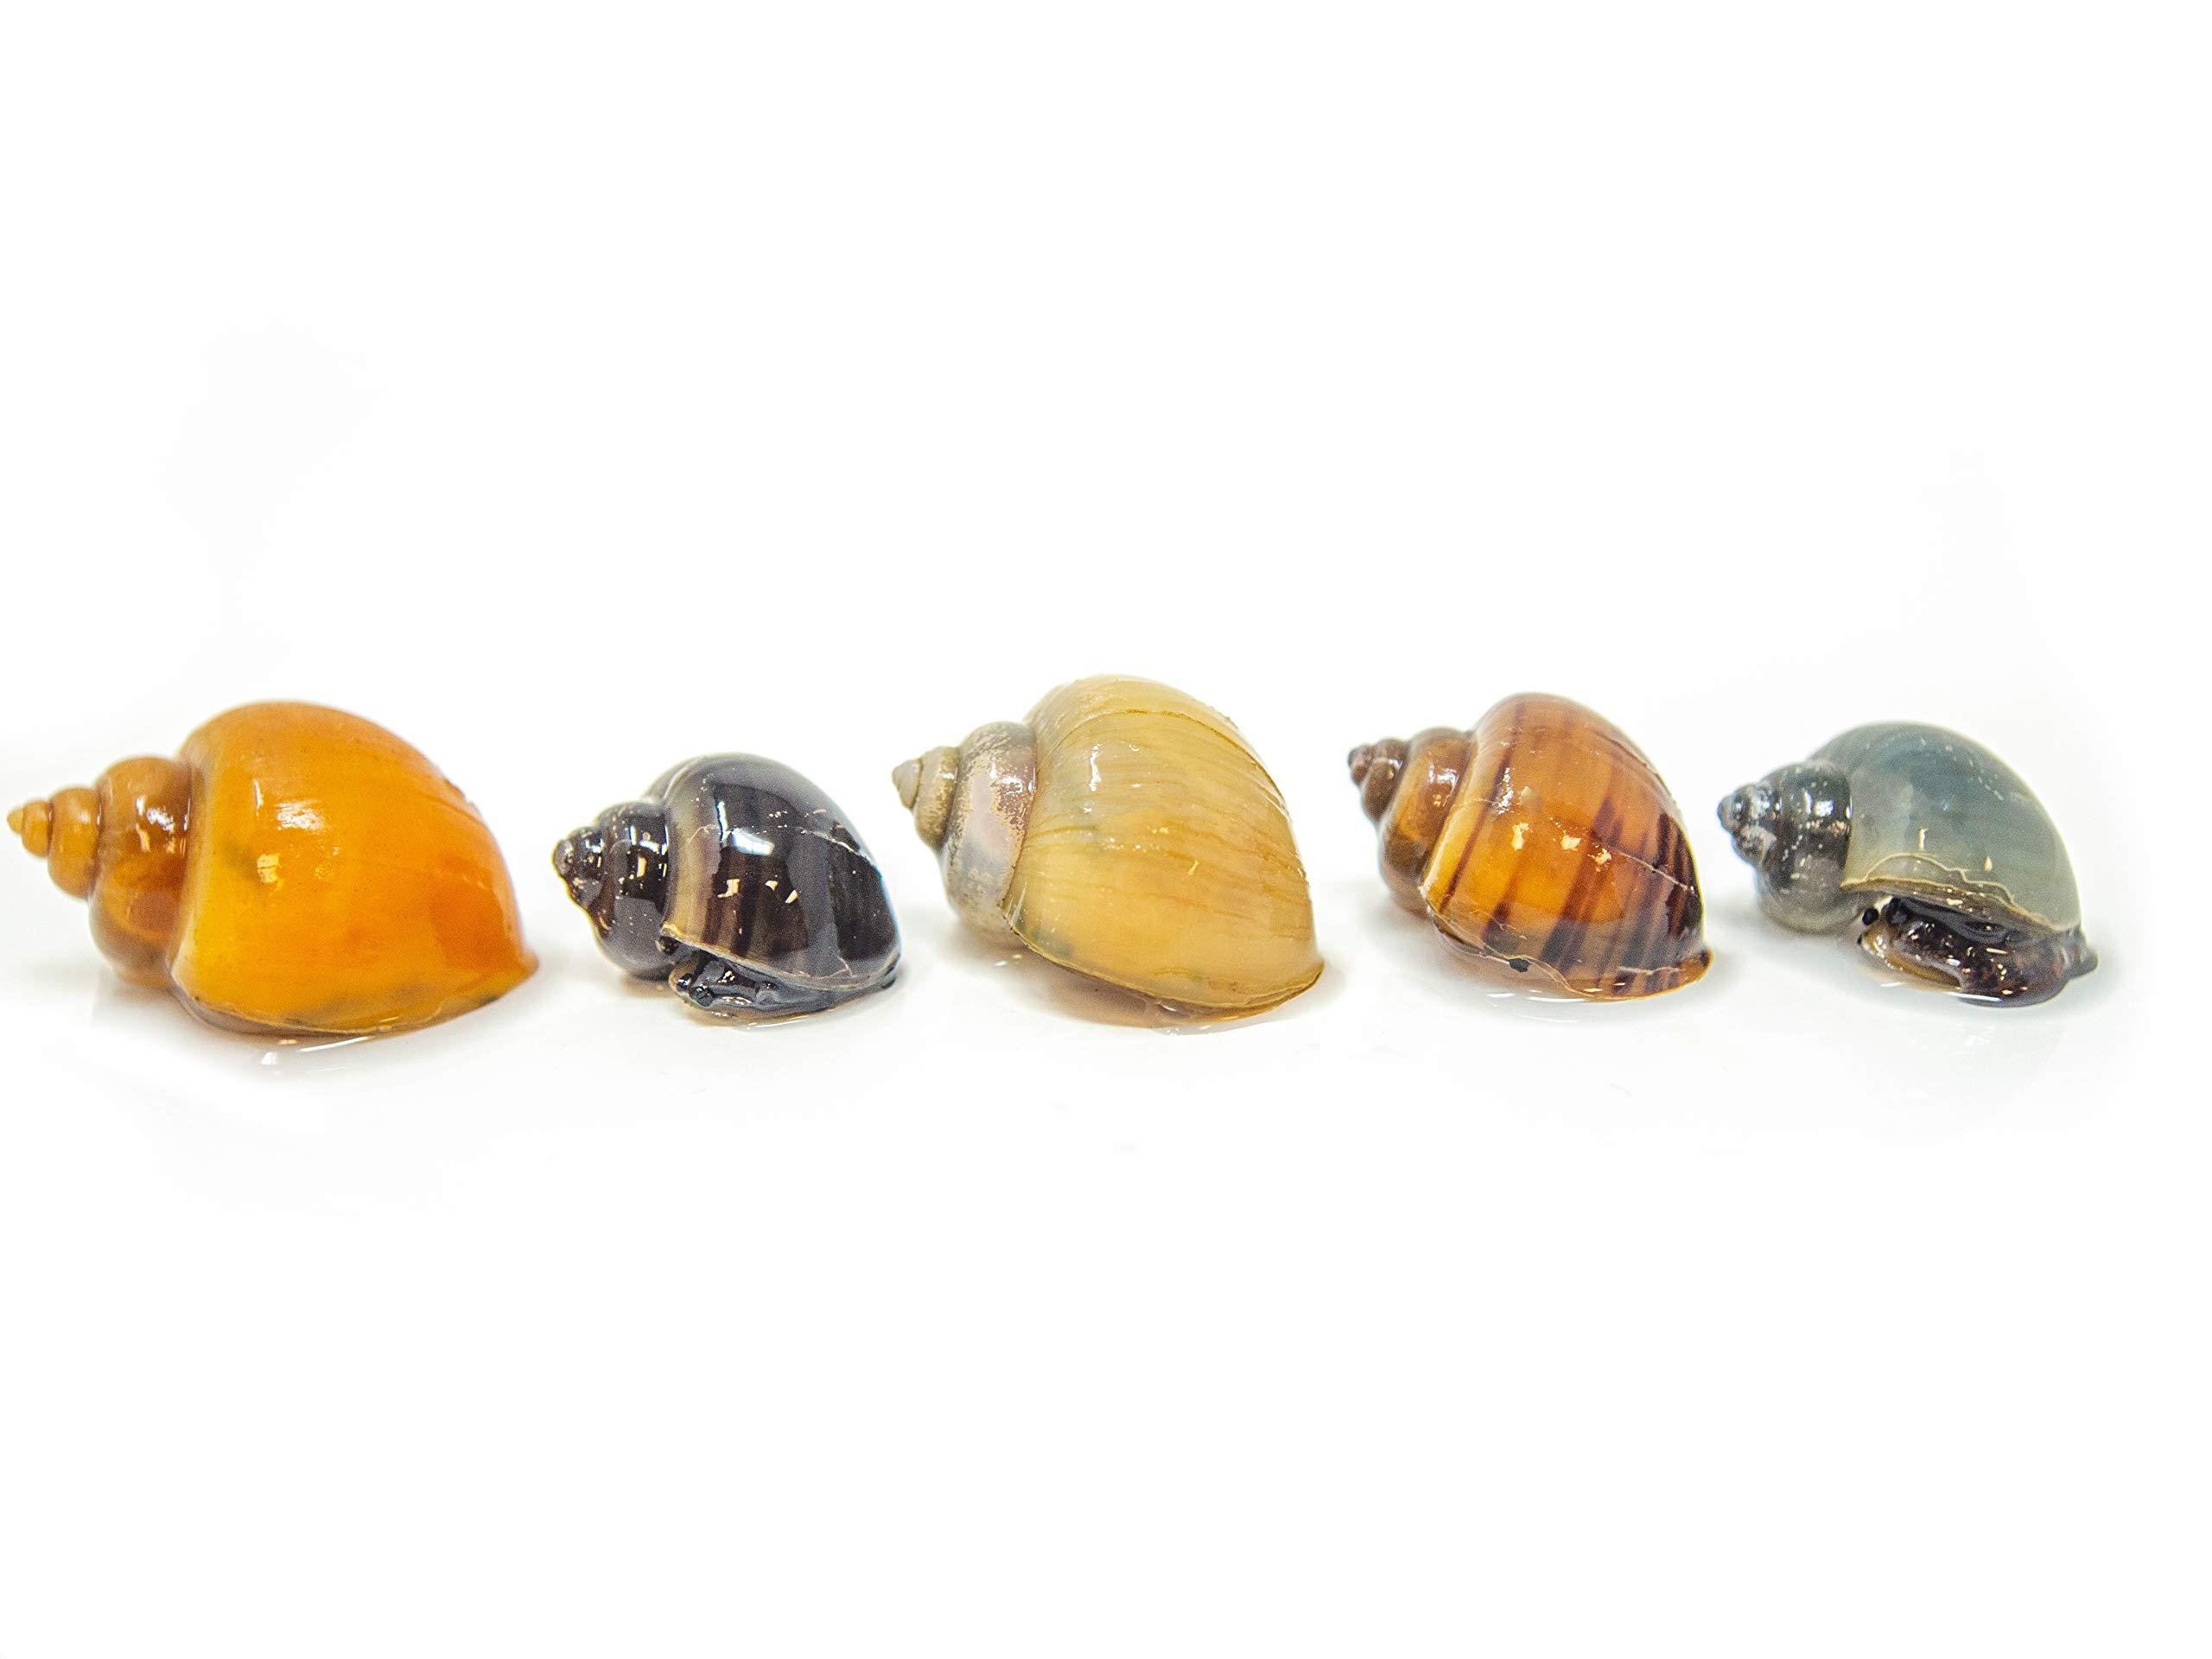 Aquatic Arts 15 Deluxe Multi-Color Mystery Snail Pack | Algae Scraper | Aquarium Substrate Cleaner | Nano Tank Filter | Safe With Tetra | Guppy Fish,, 0.7 Lb ()